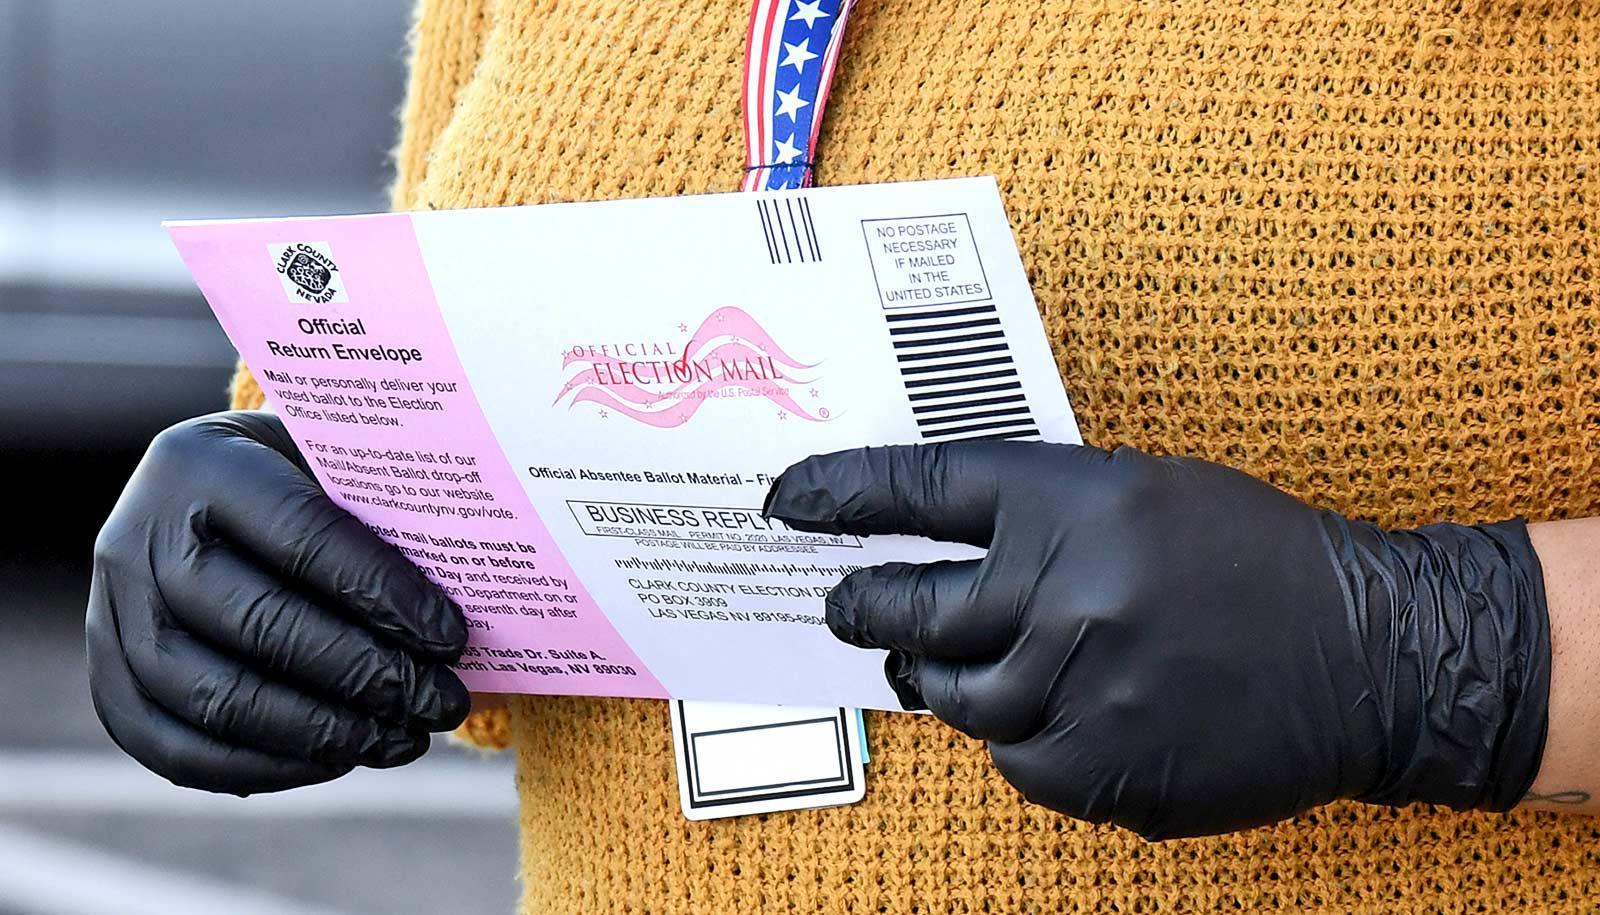 gloved hands hold ballot